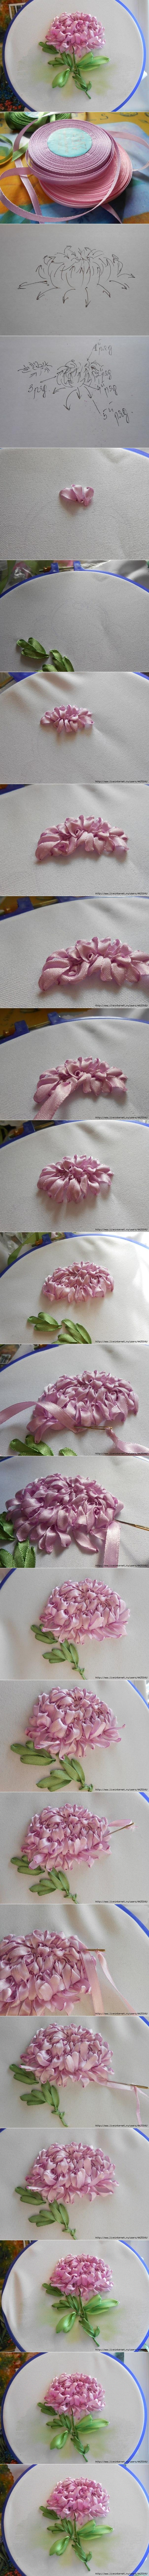 ribbon embroidery chrysanthemum tutorial